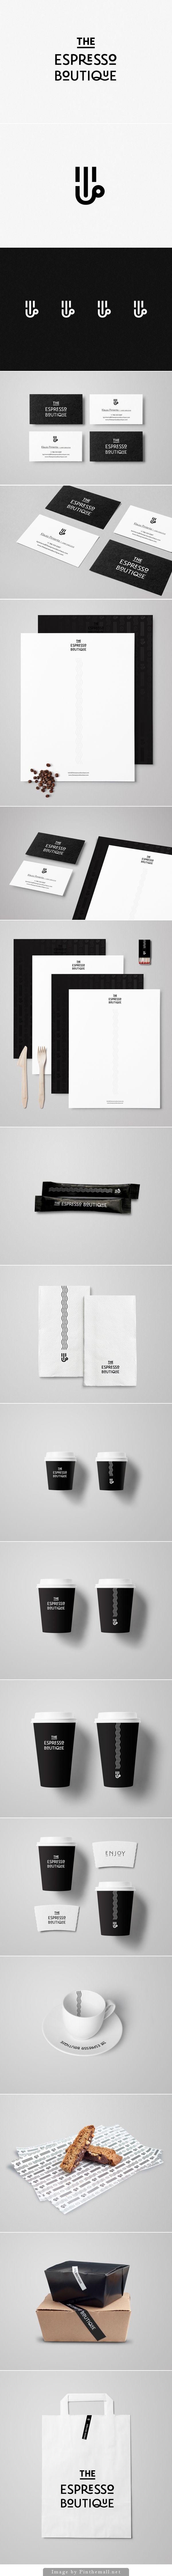 Great stationary design including logo, letter head, business card, envelope and product design. #design